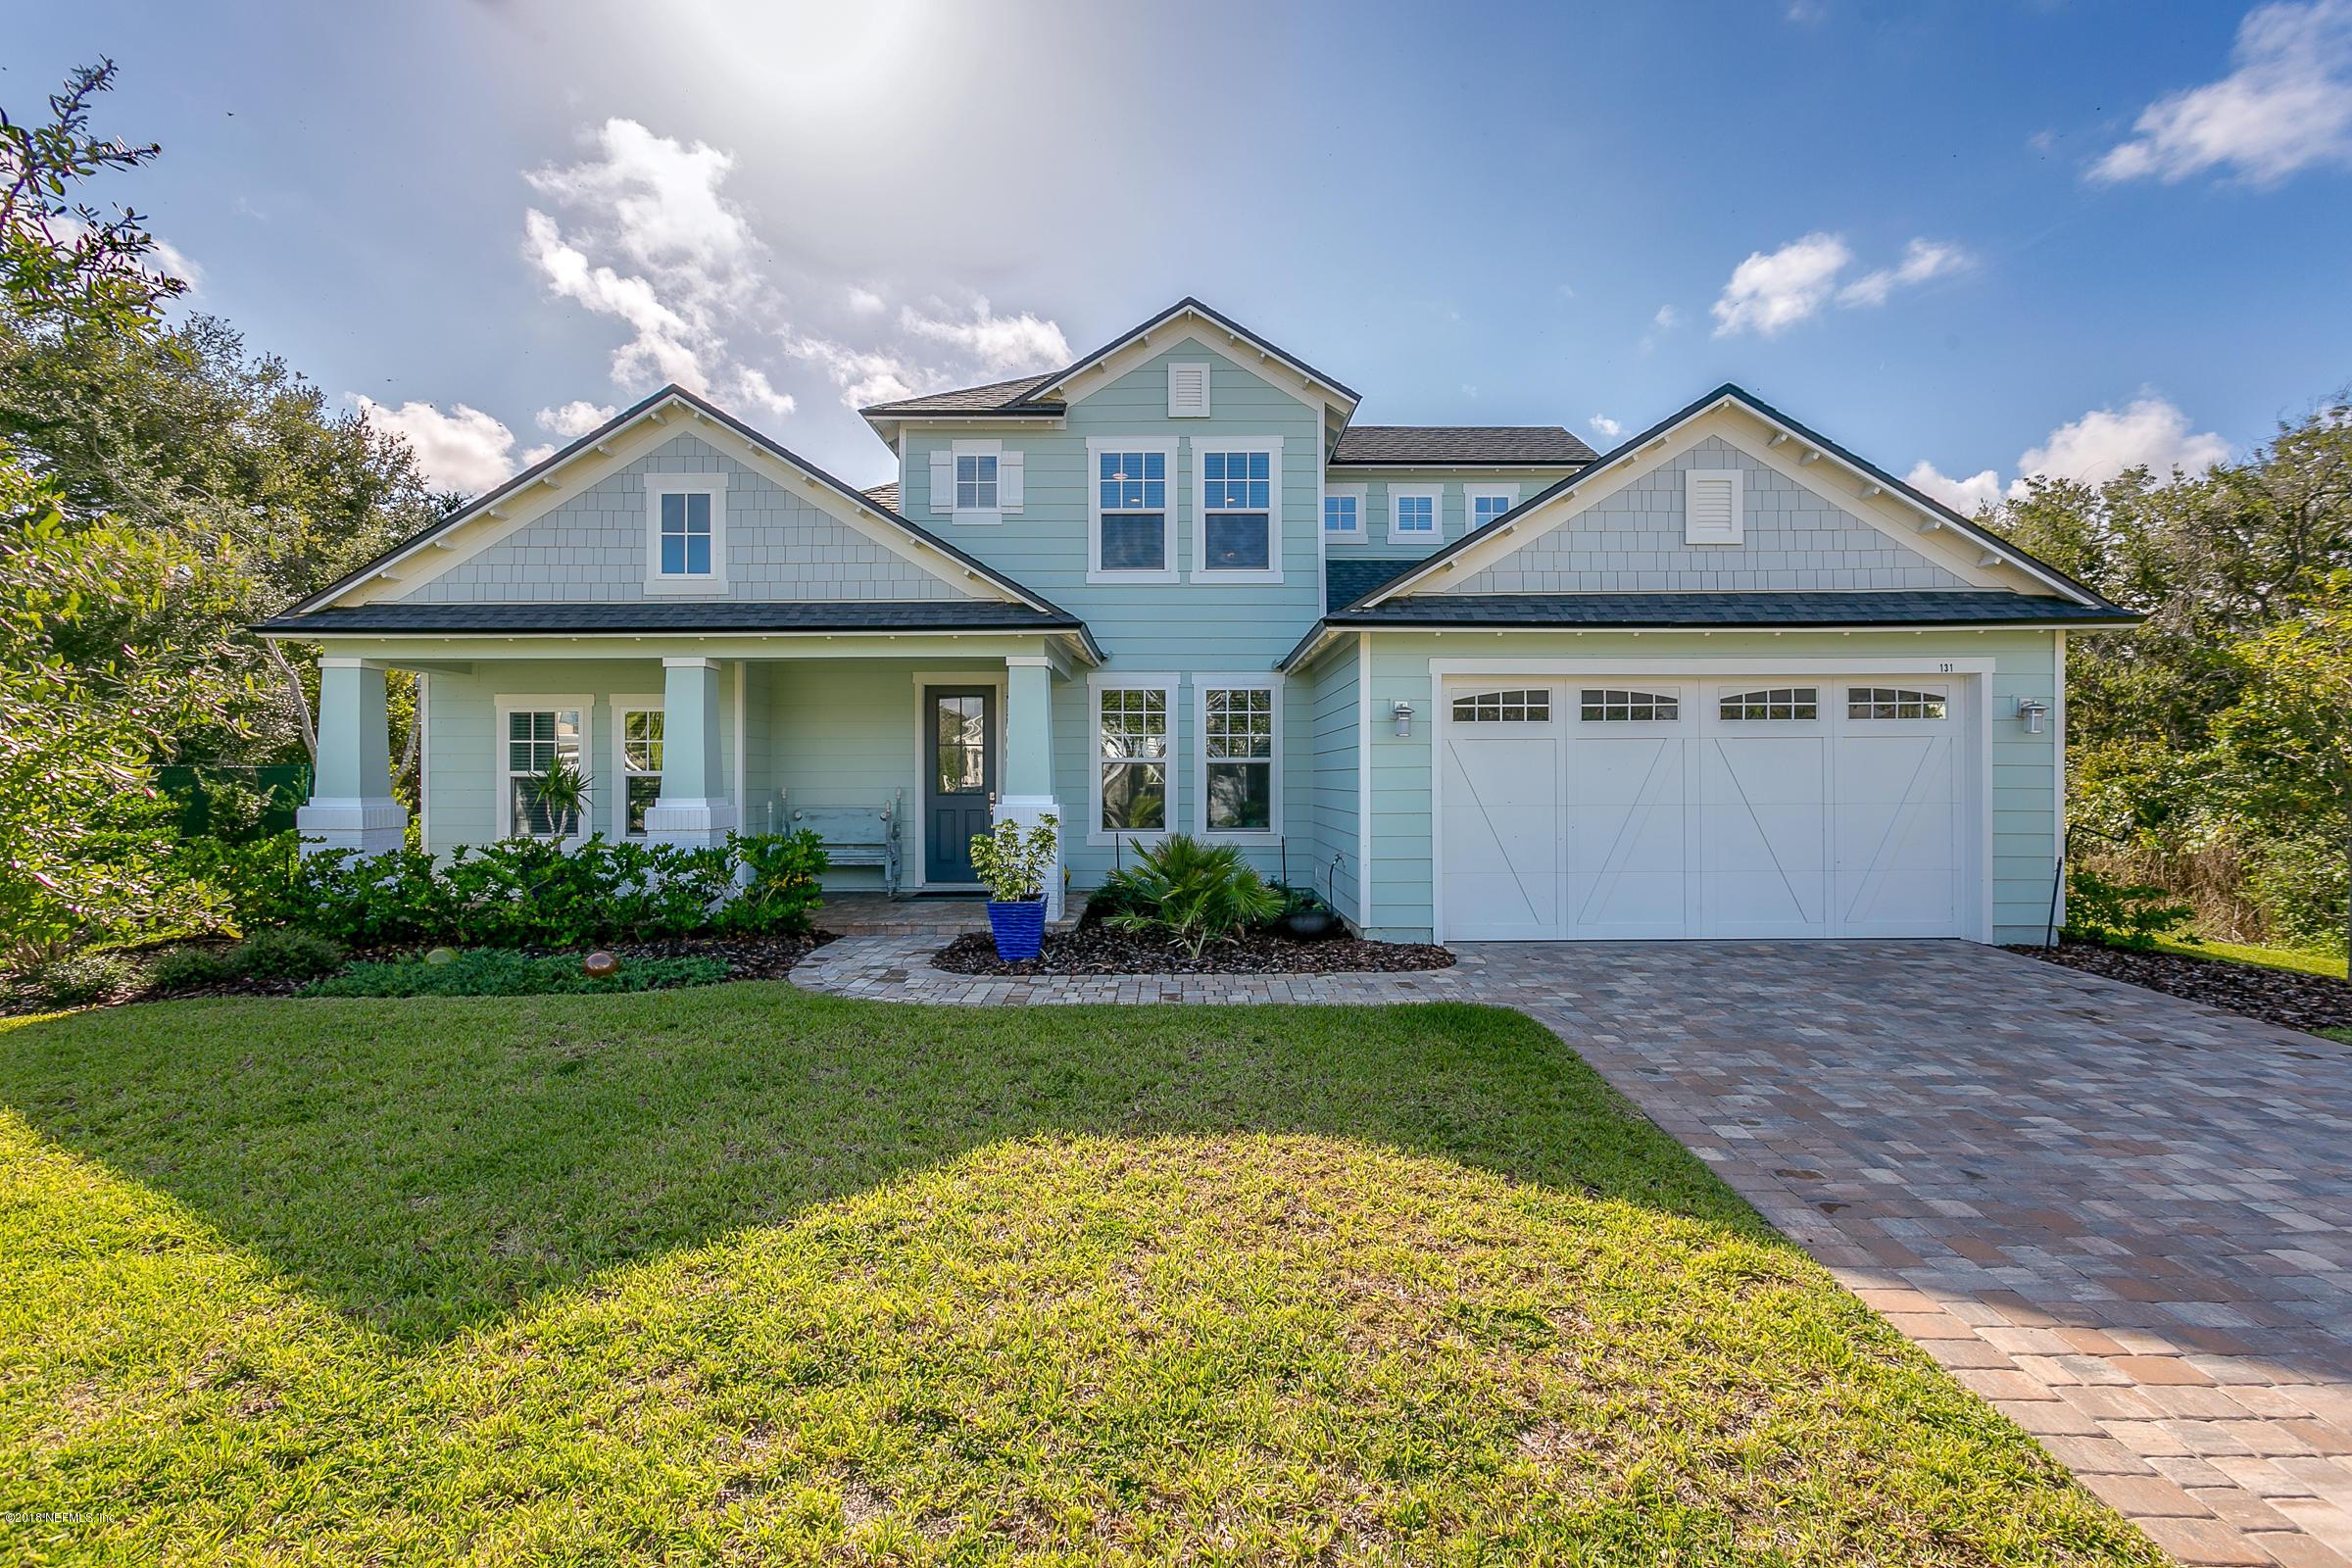 131 ESPANITA, ST AUGUSTINE, FLORIDA 32080, 5 Bedrooms Bedrooms, ,4 BathroomsBathrooms,Residential - single family,For sale,ESPANITA,959182